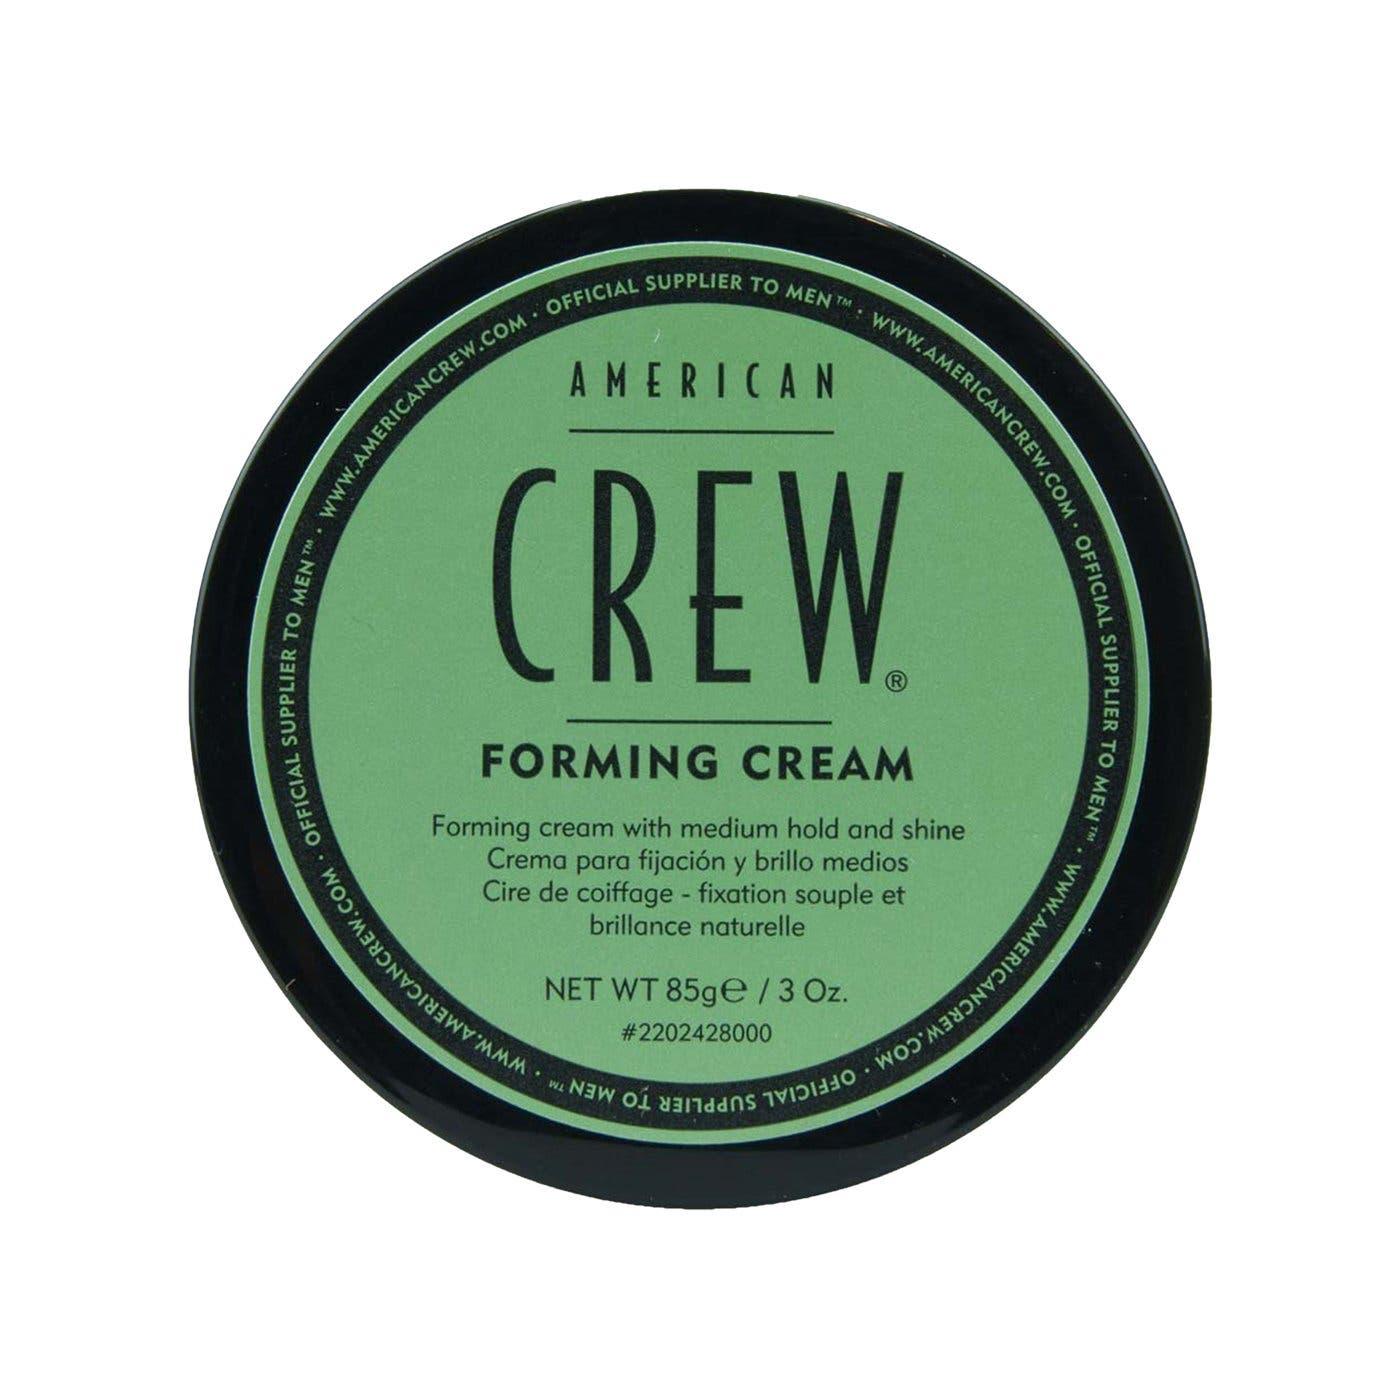 American Crew Forming Cream Styling 3Oz / 85g